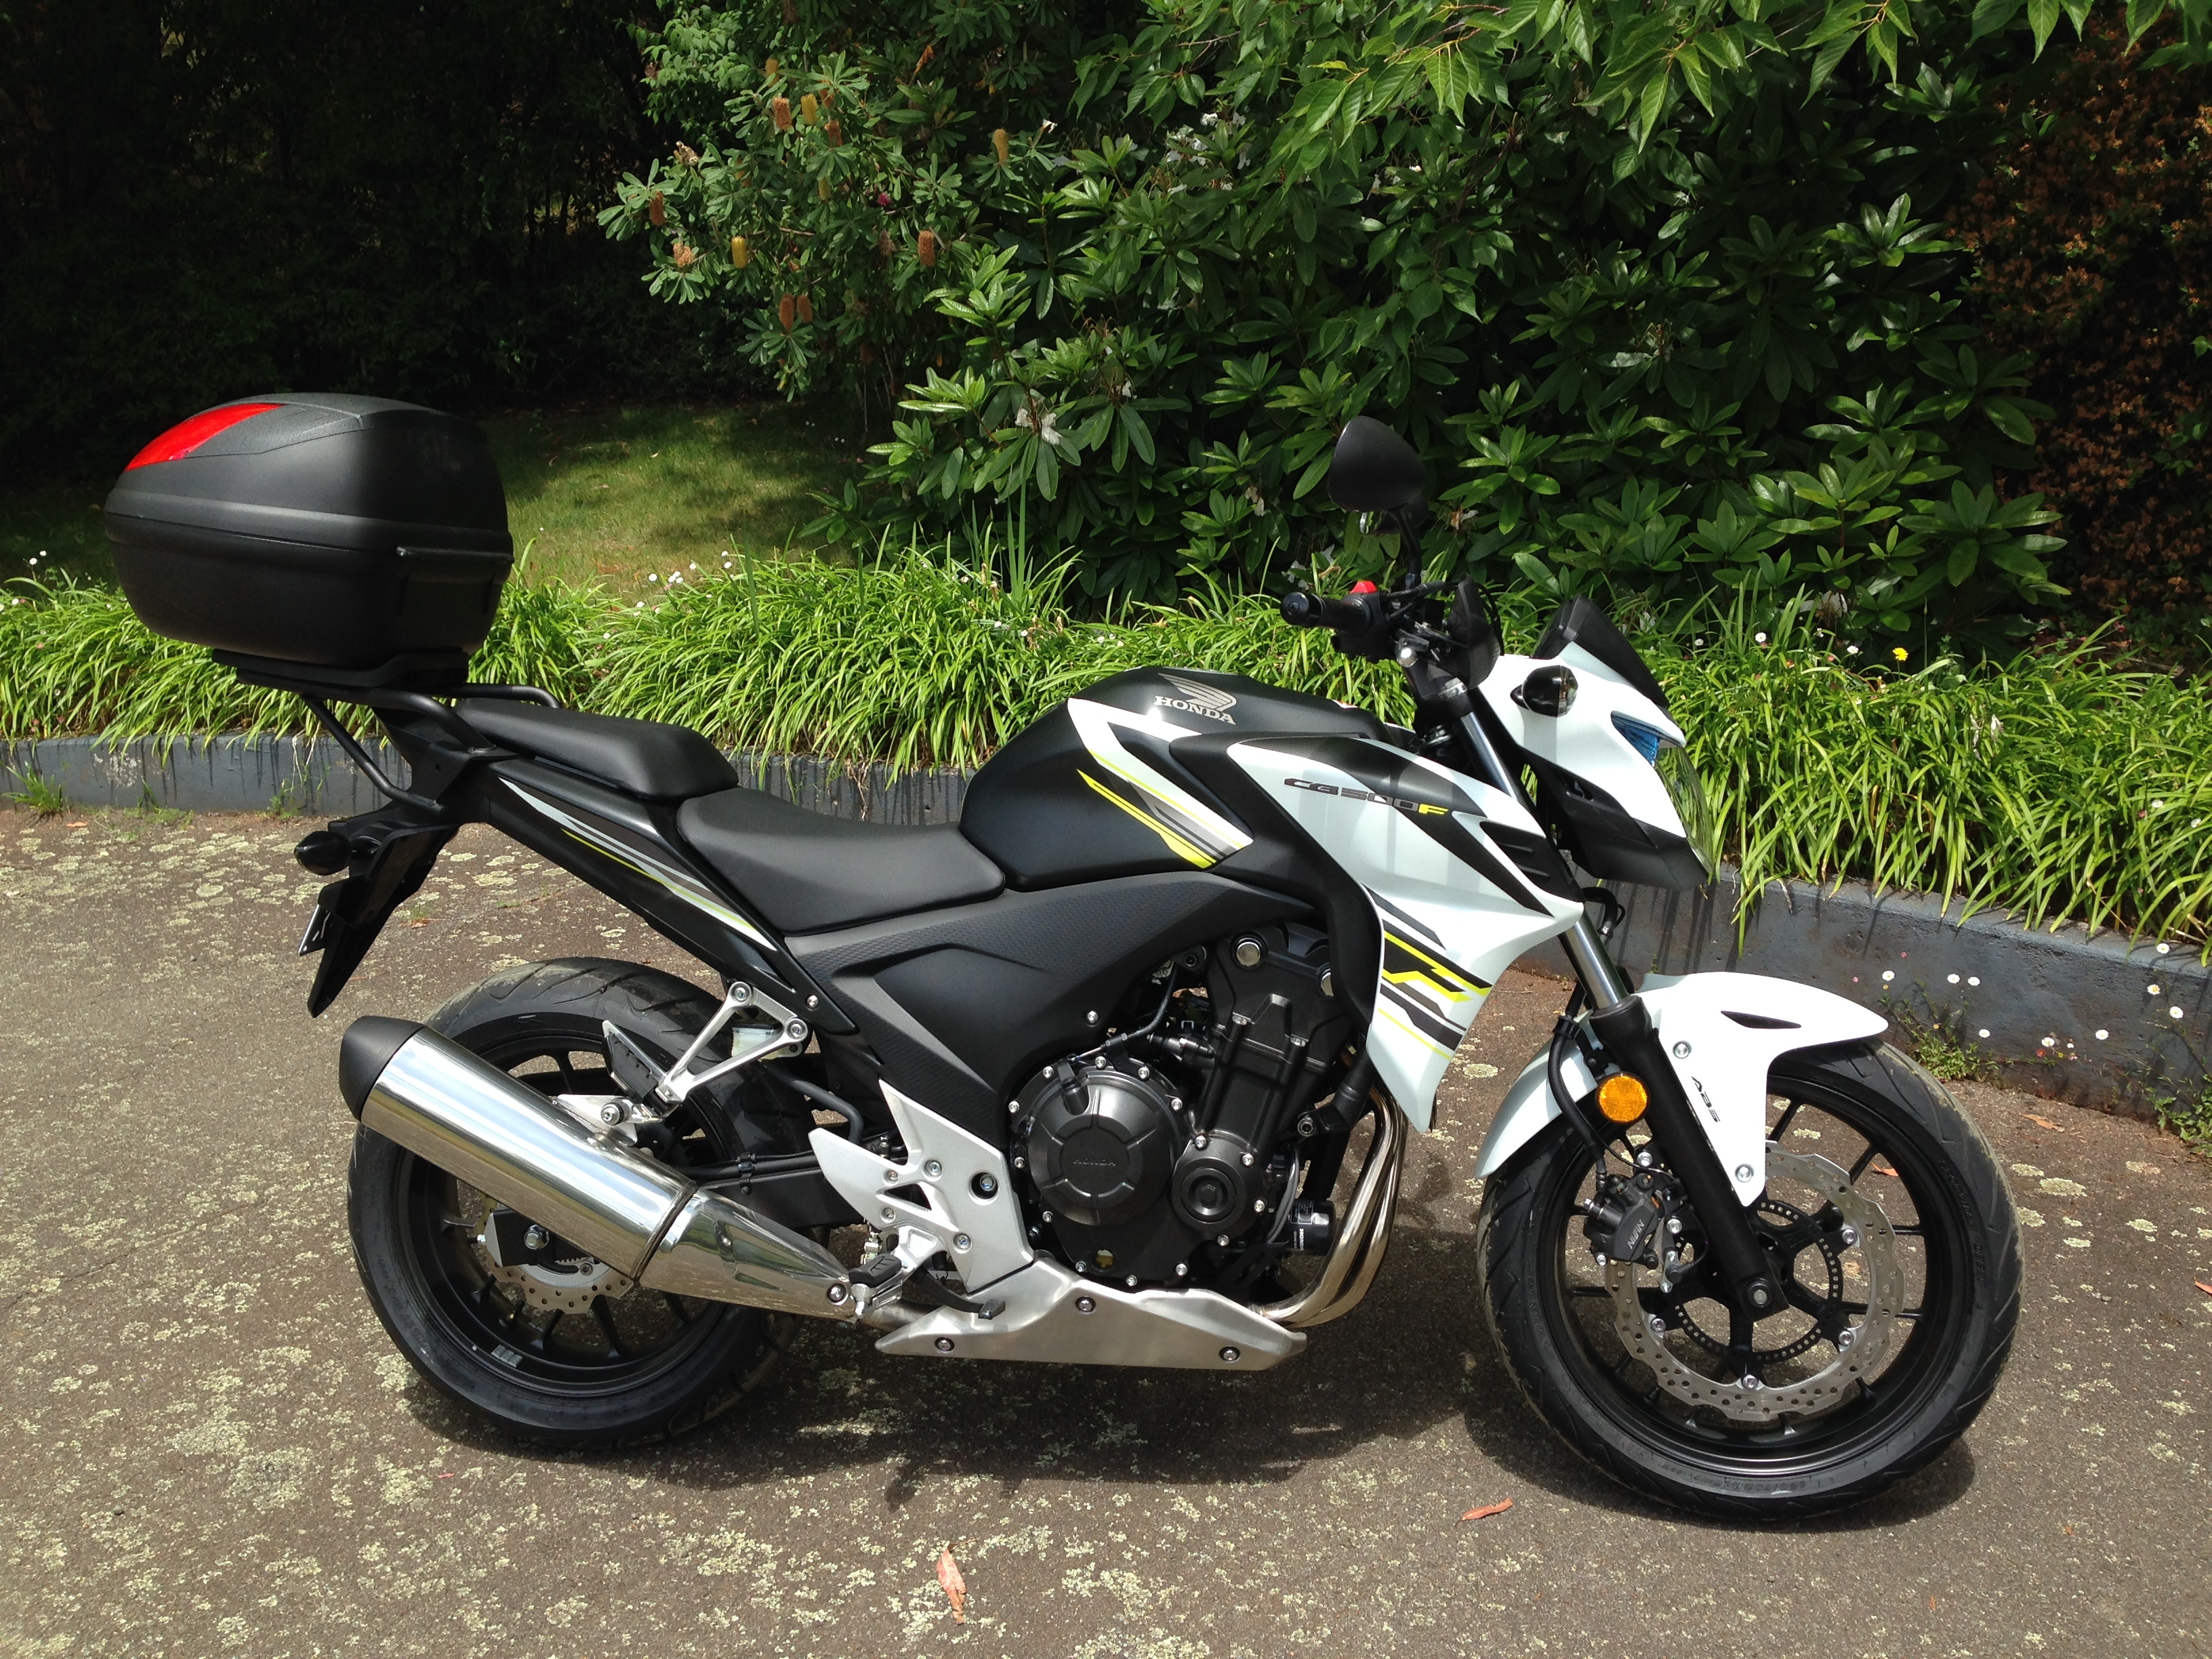 tasmanian motorcycle hire motorbike rental tasmania. Black Bedroom Furniture Sets. Home Design Ideas